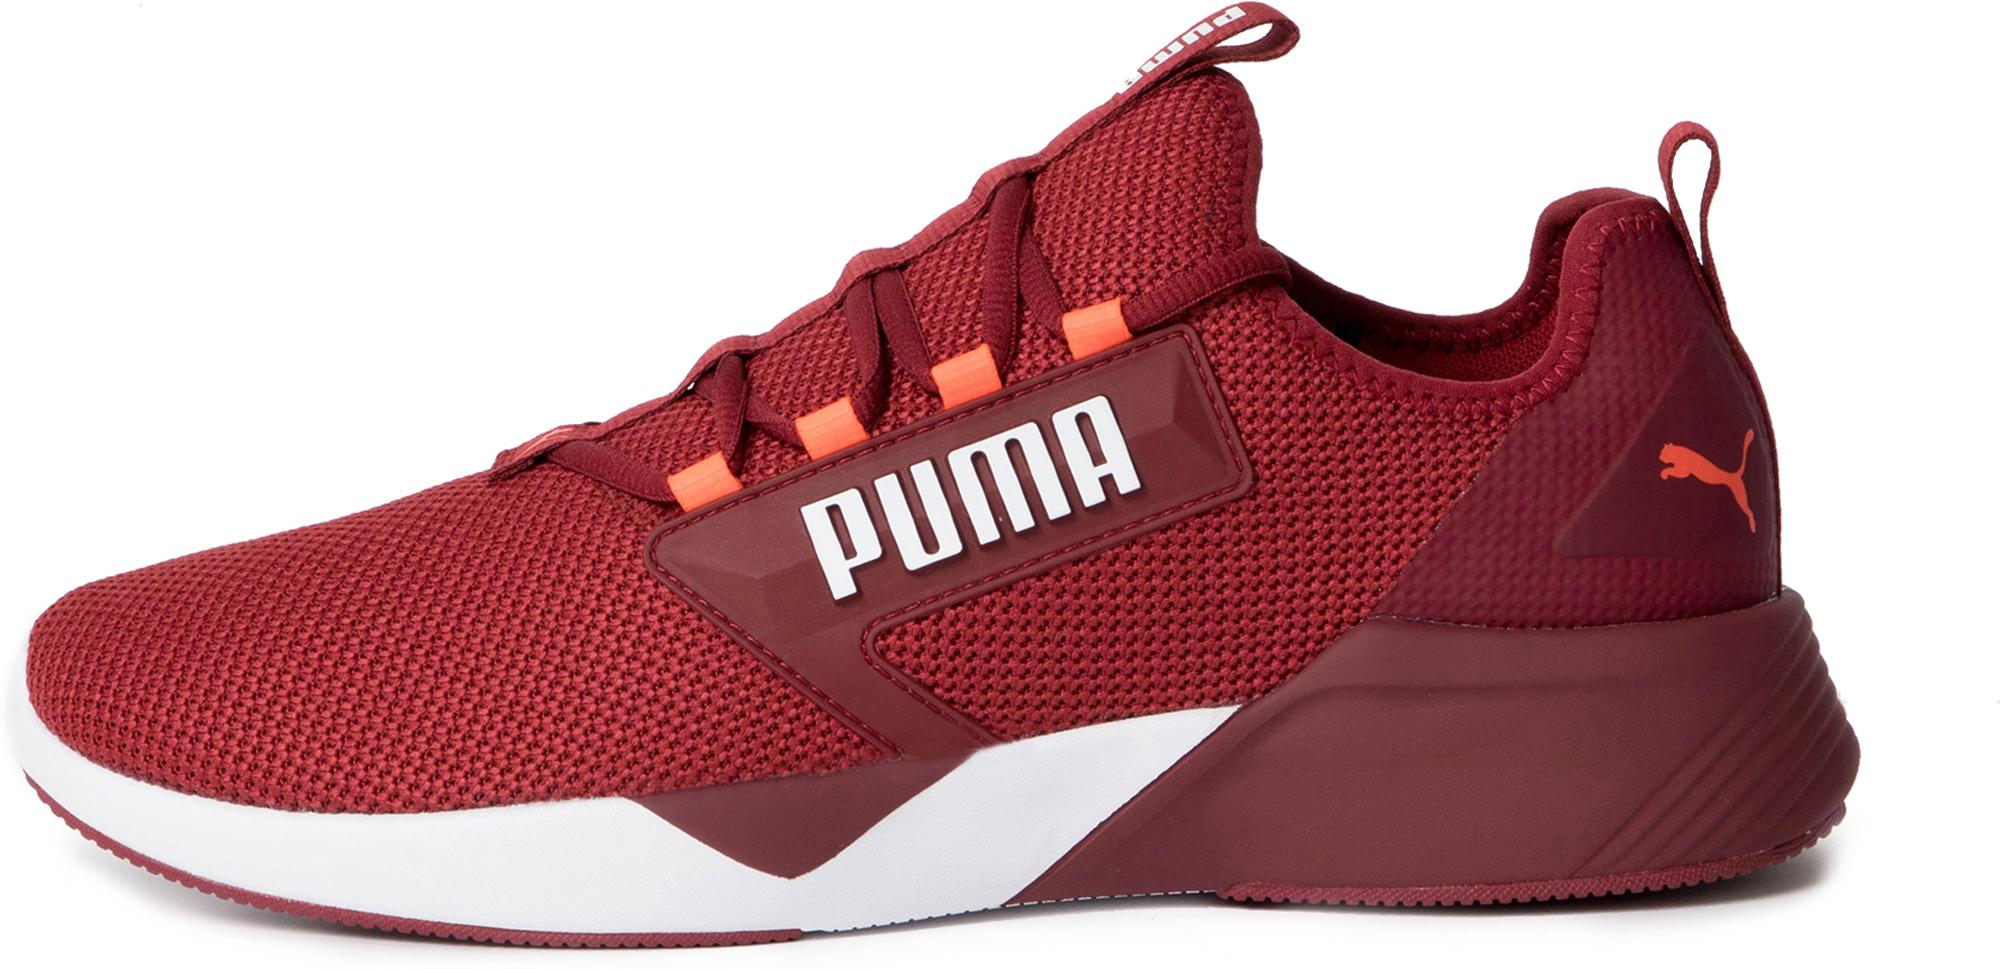 Puma Кроссовки мужские Puma Retaliate, размер 39.5 puma кроссовки мужские puma hybrid nx ozone размер 41